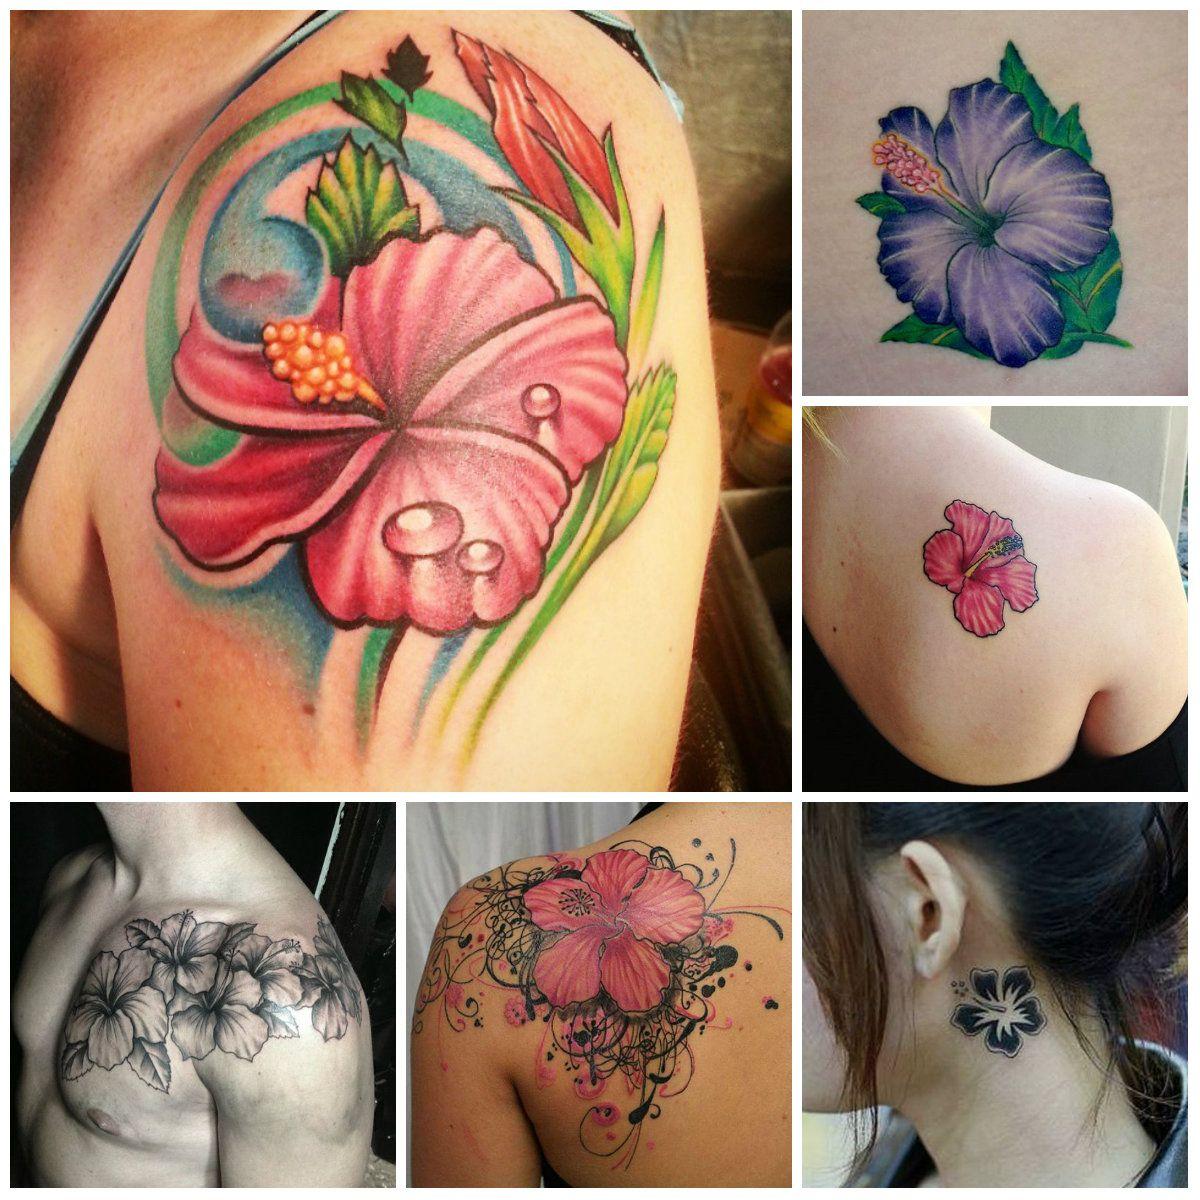 Flower tattoos fashion pinterest flower tattoos hibiscus flower tattoos izmirmasajfo Images